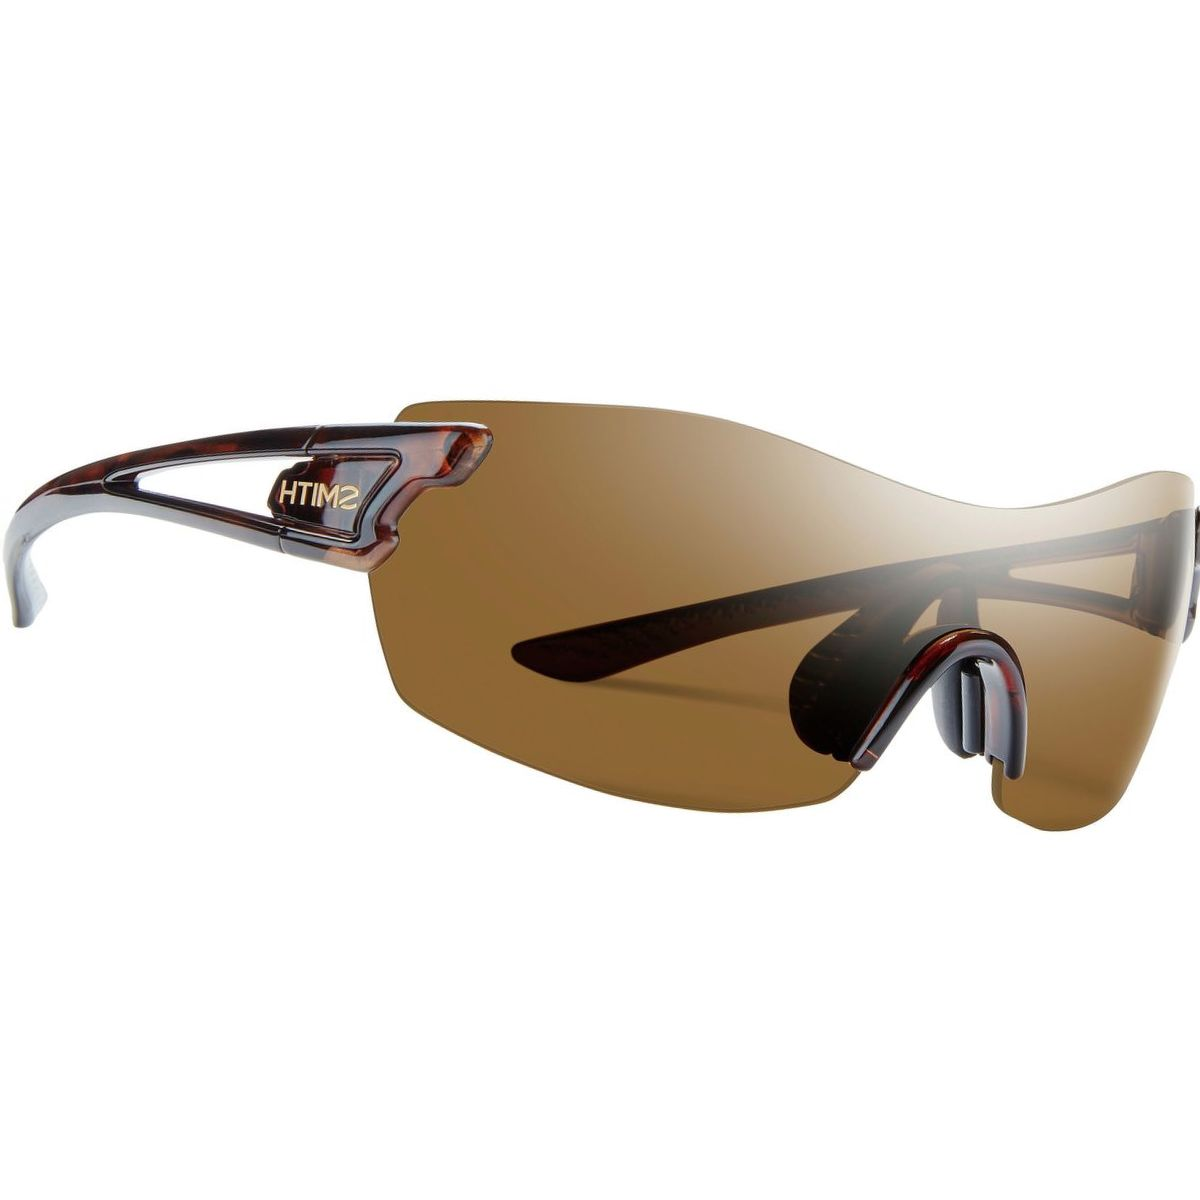 Smith Pivlock Asana ChromaPop Sunglasses - Women's